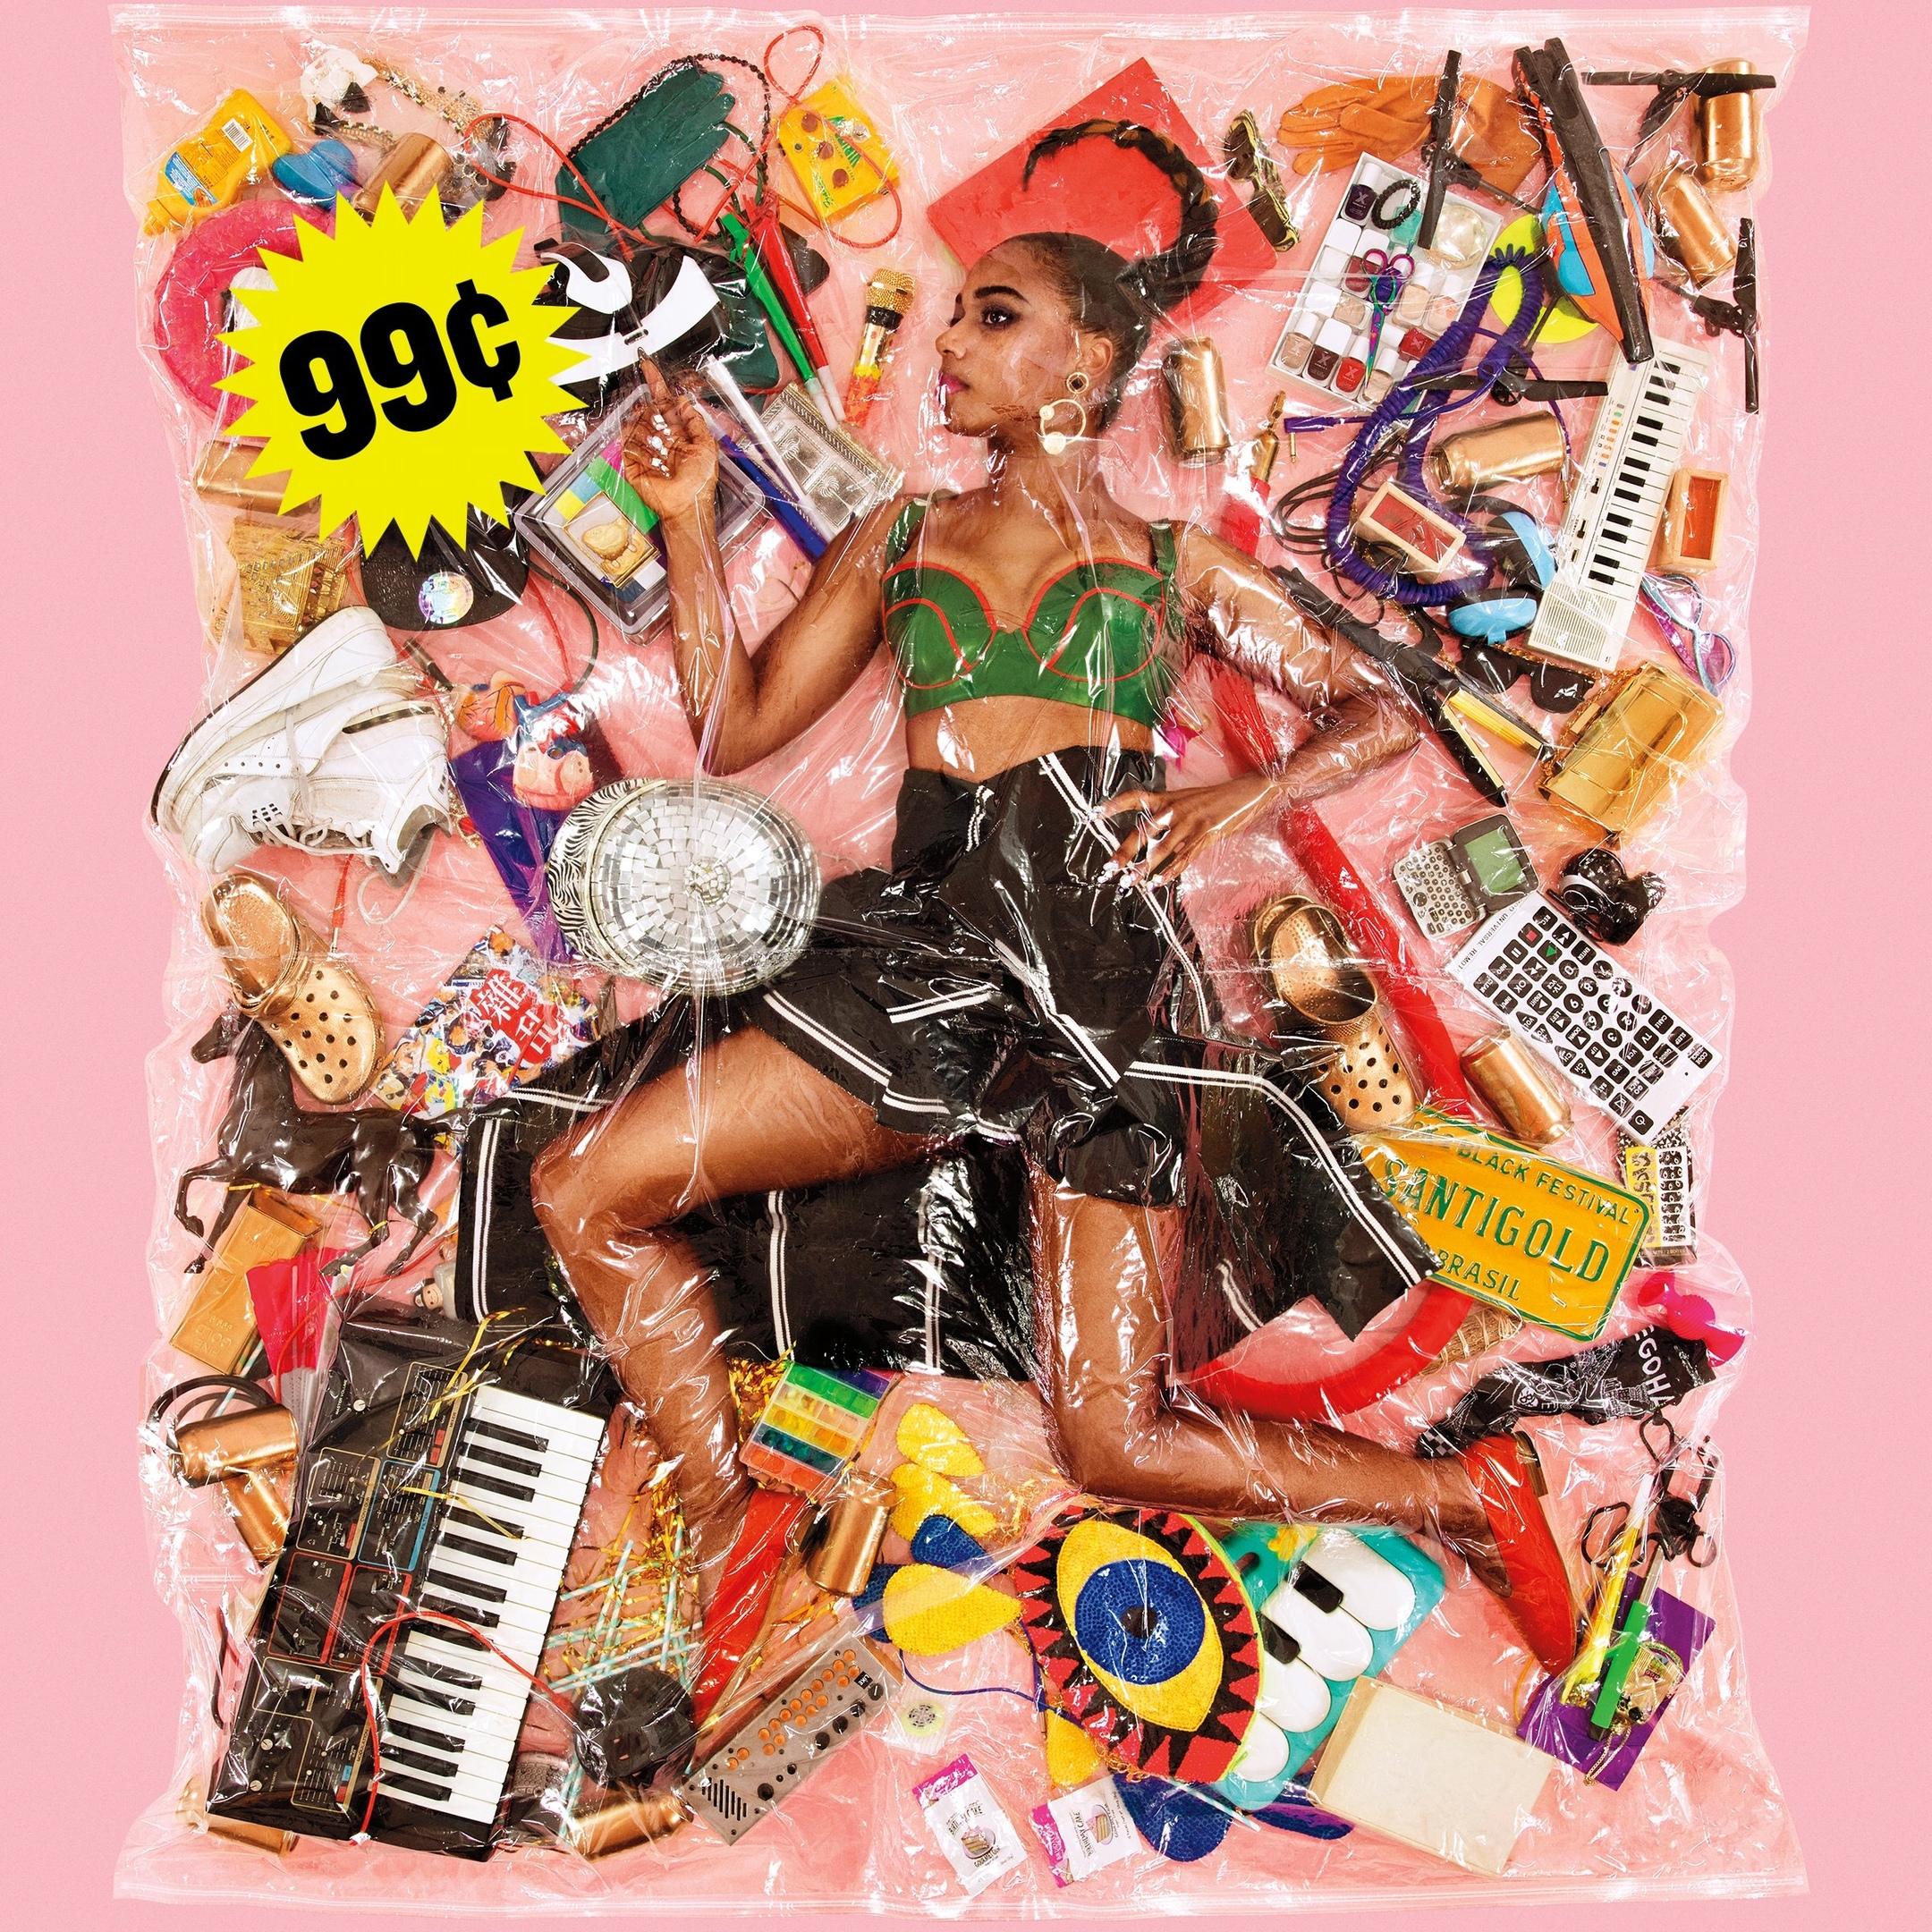 Santigold album 99¢